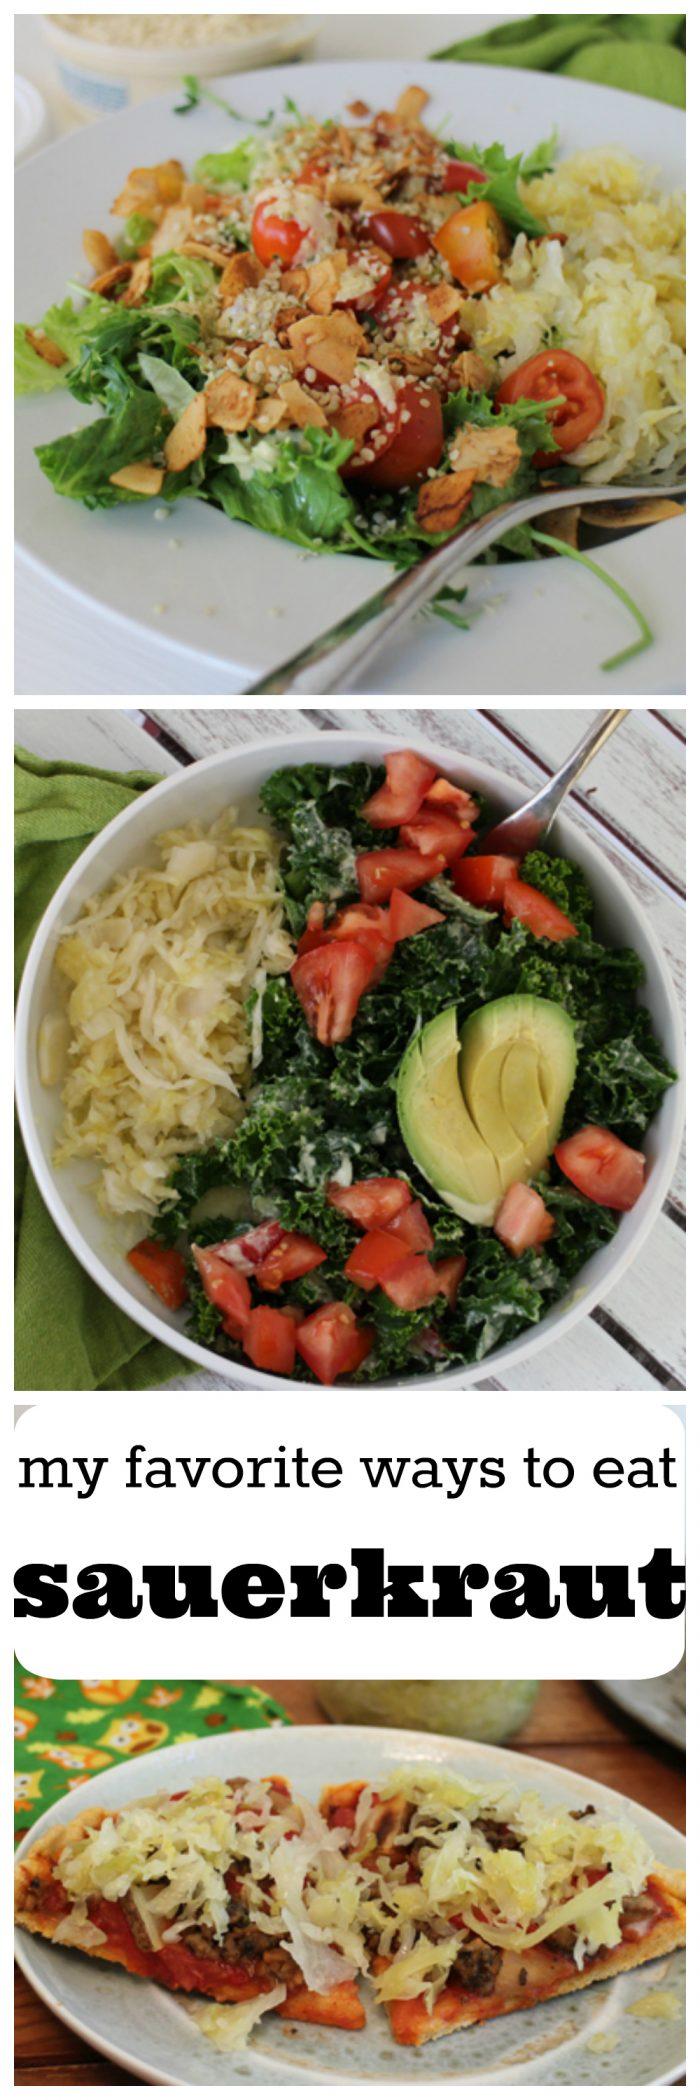 My favorite ways to enjoy sauerkraut | cadryskitchen.com #vegan